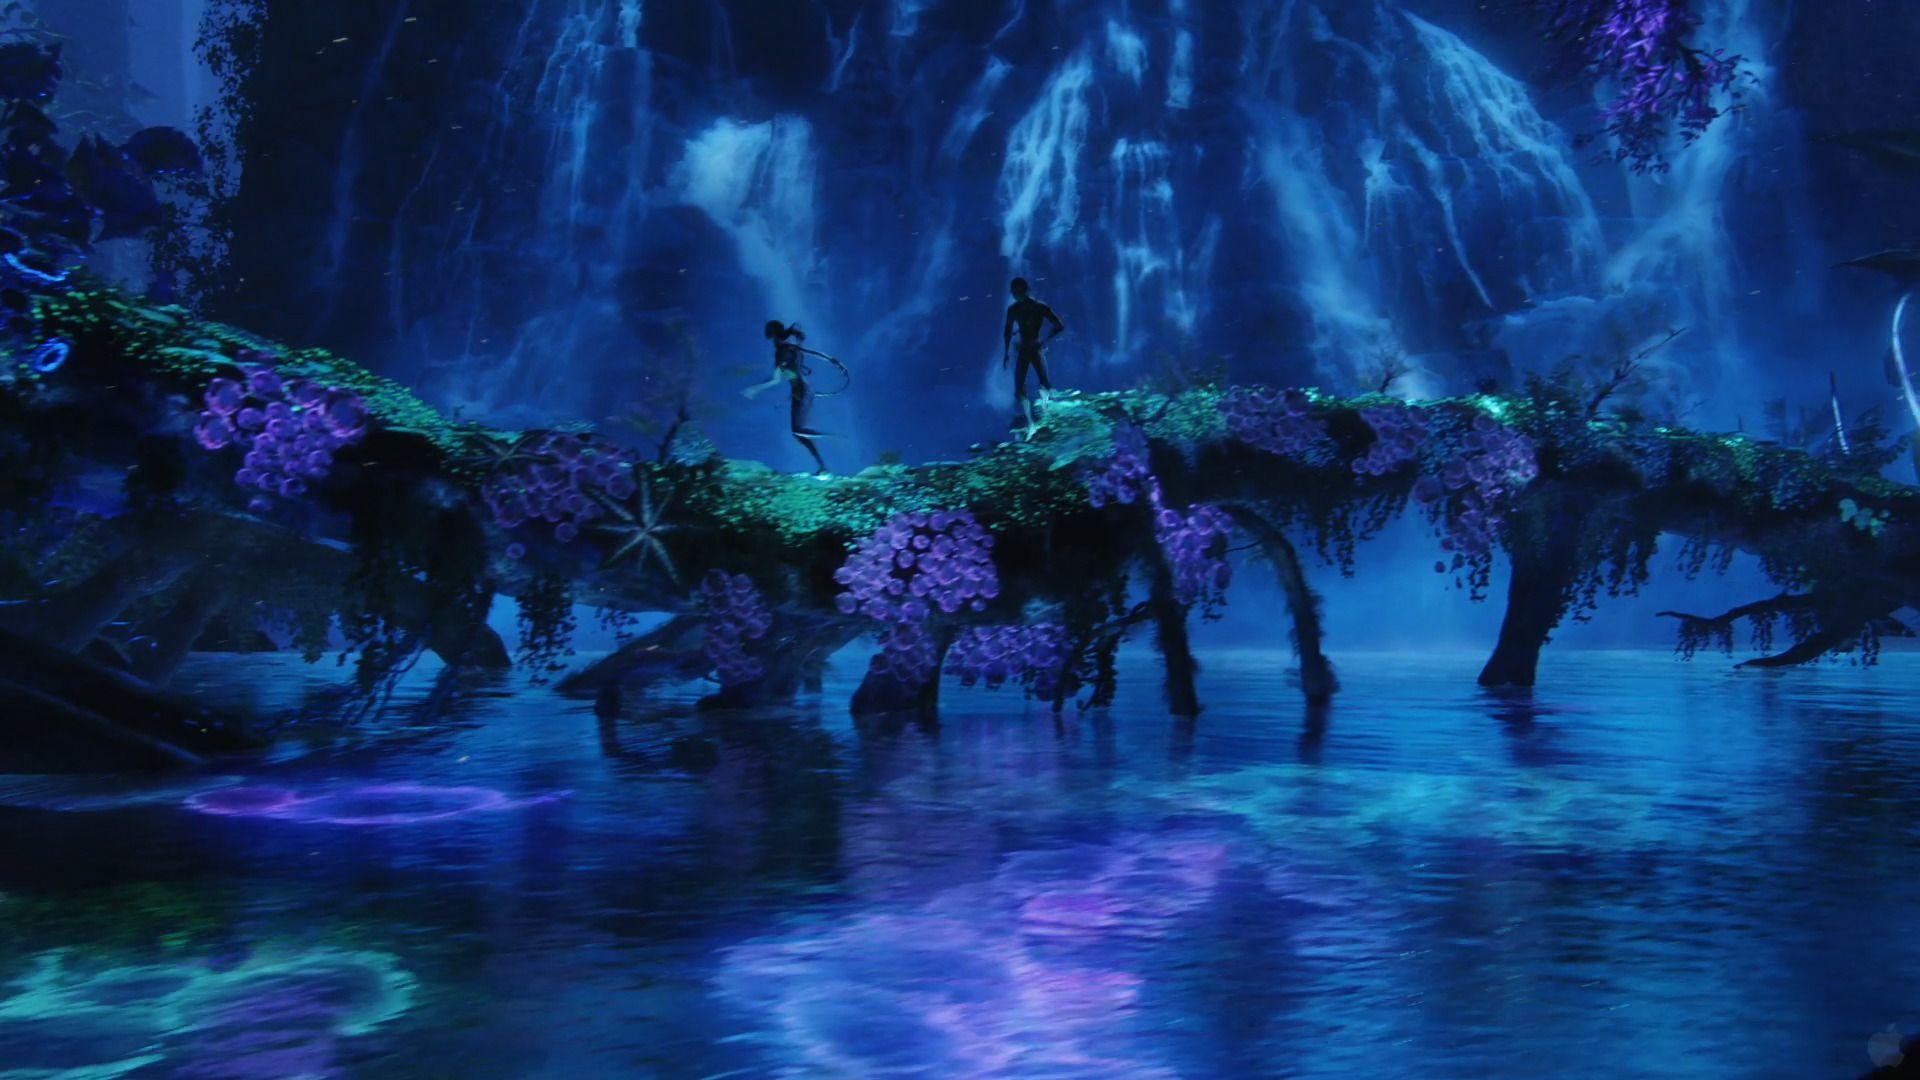 Planet Pandora Blue Lagoon From Avatar Wallpaper Click